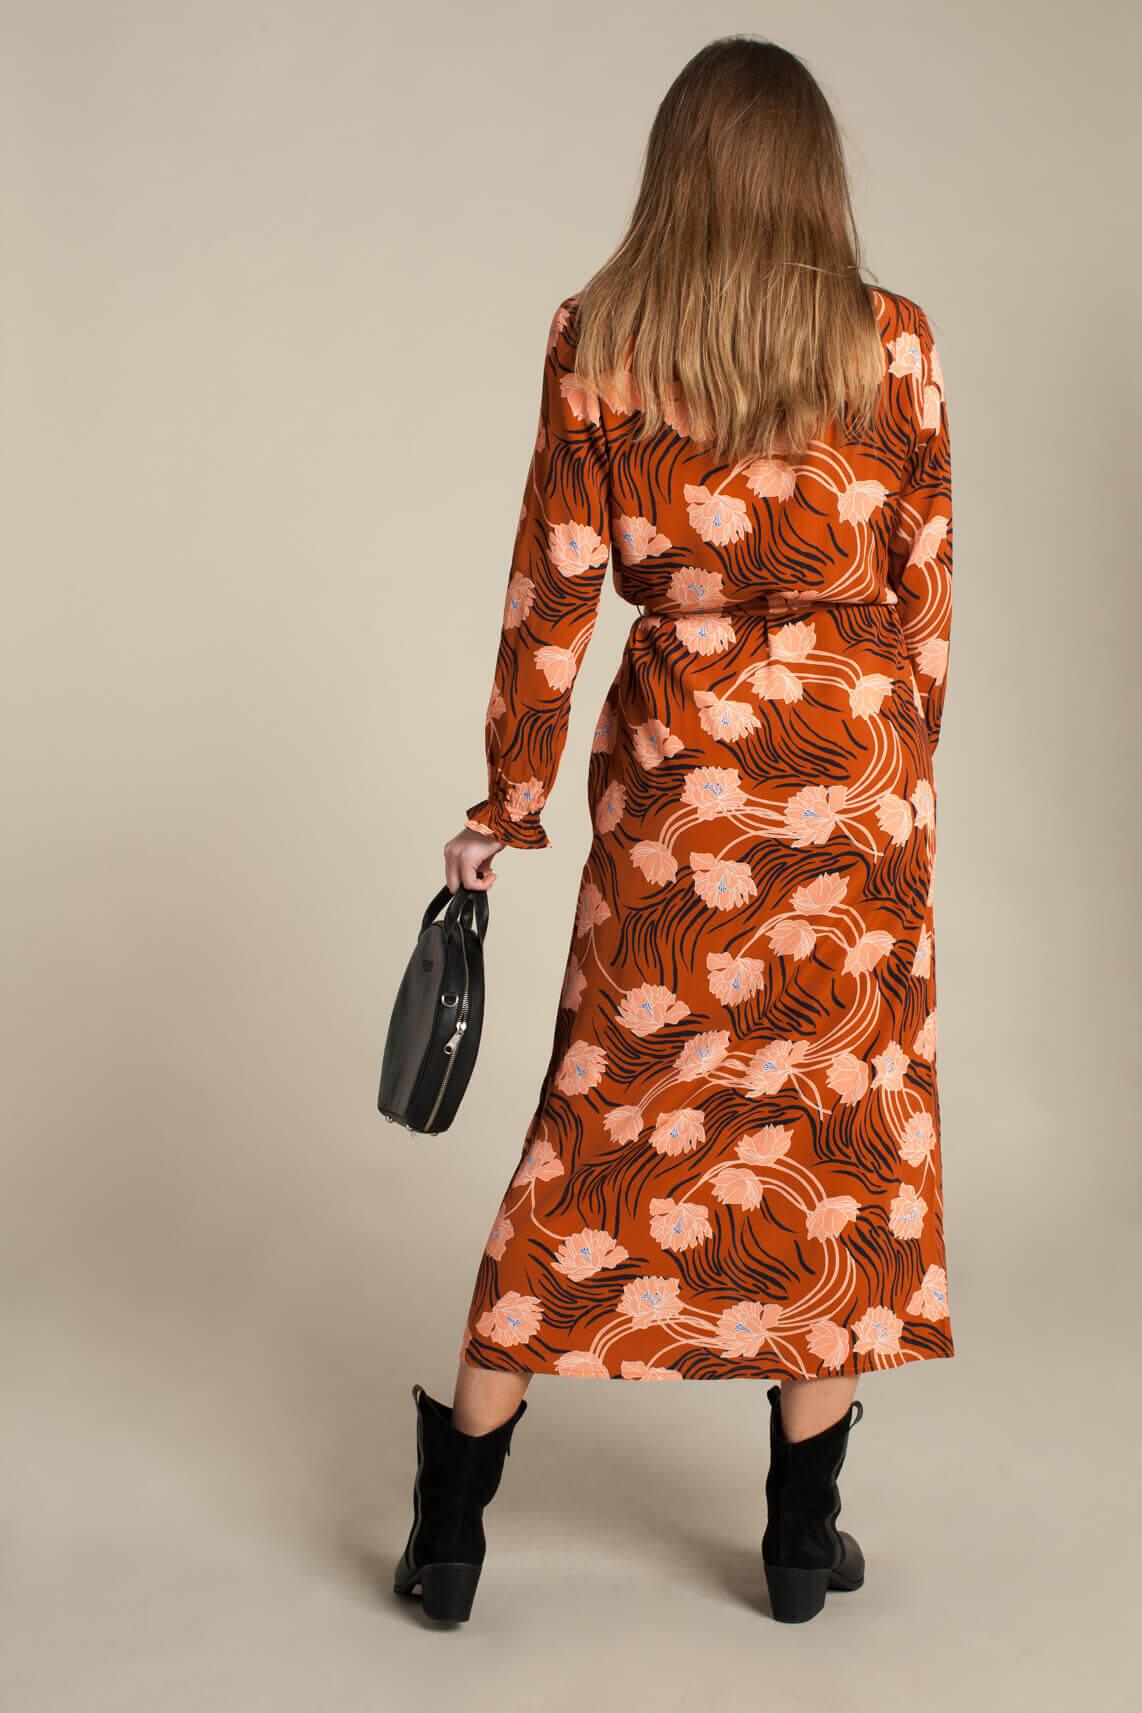 Anna Dames Lange jurk met bloemenprint Bruin